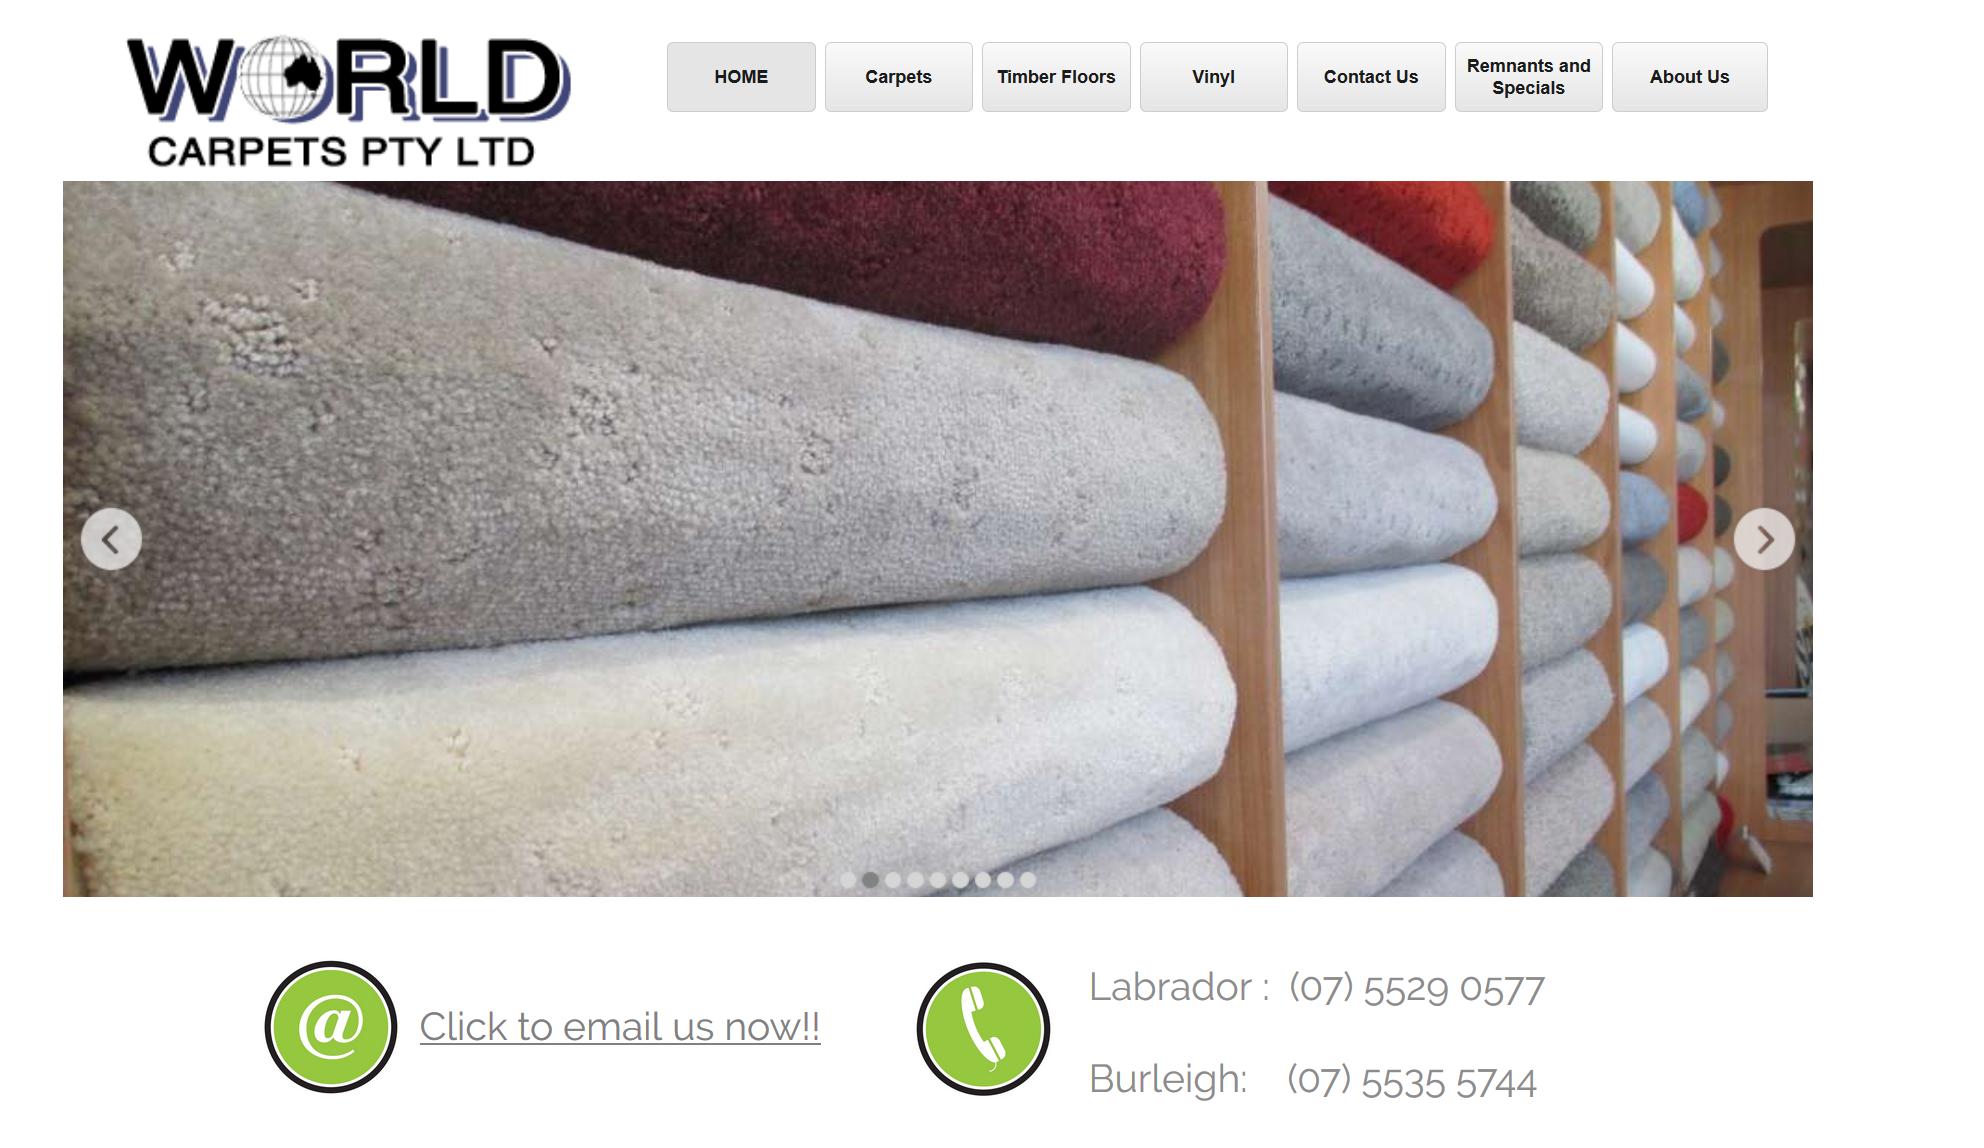 World Carpets - http://worldcarpets.com.au/